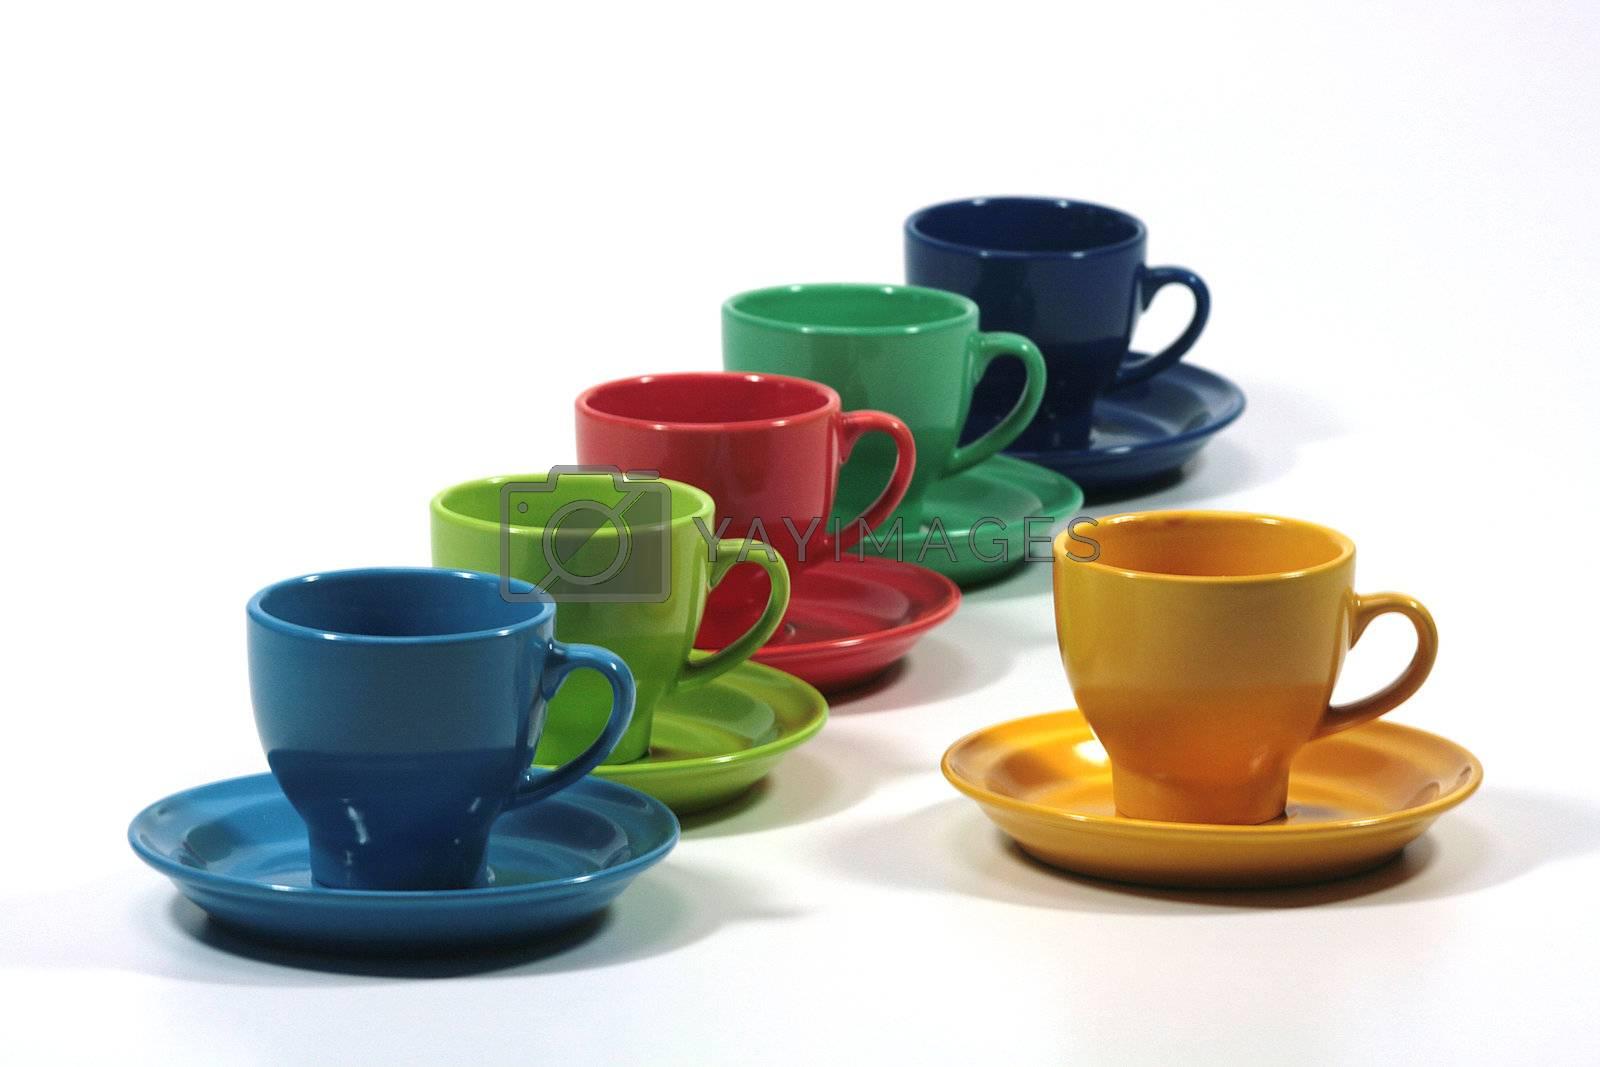 Color tea cups - photos for designers